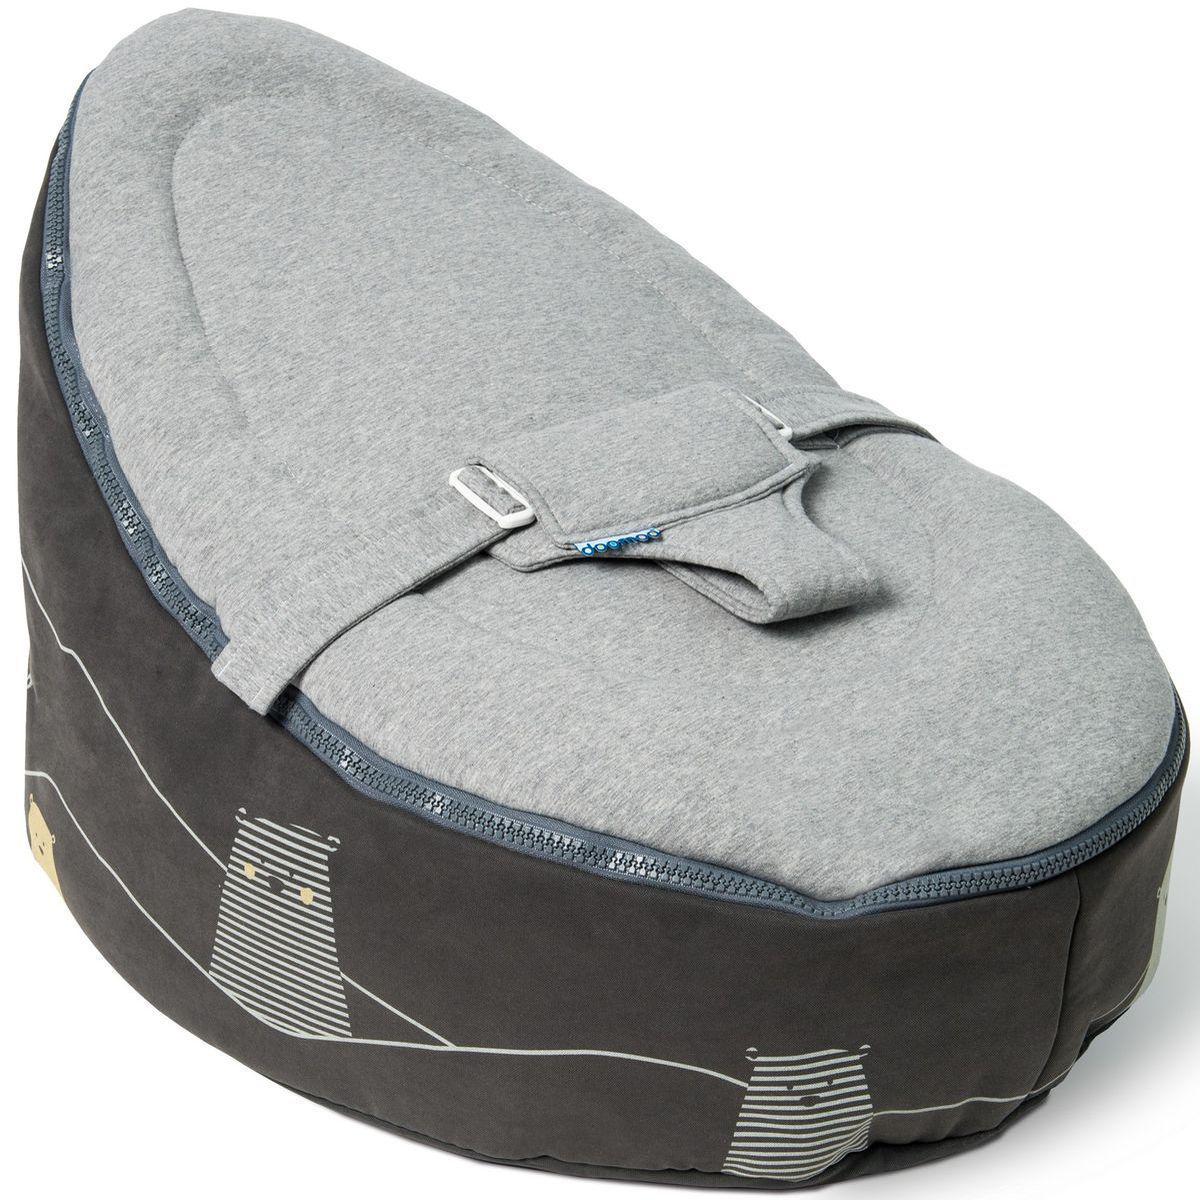 Pouf-relax SEAT Doomoo bear-grey